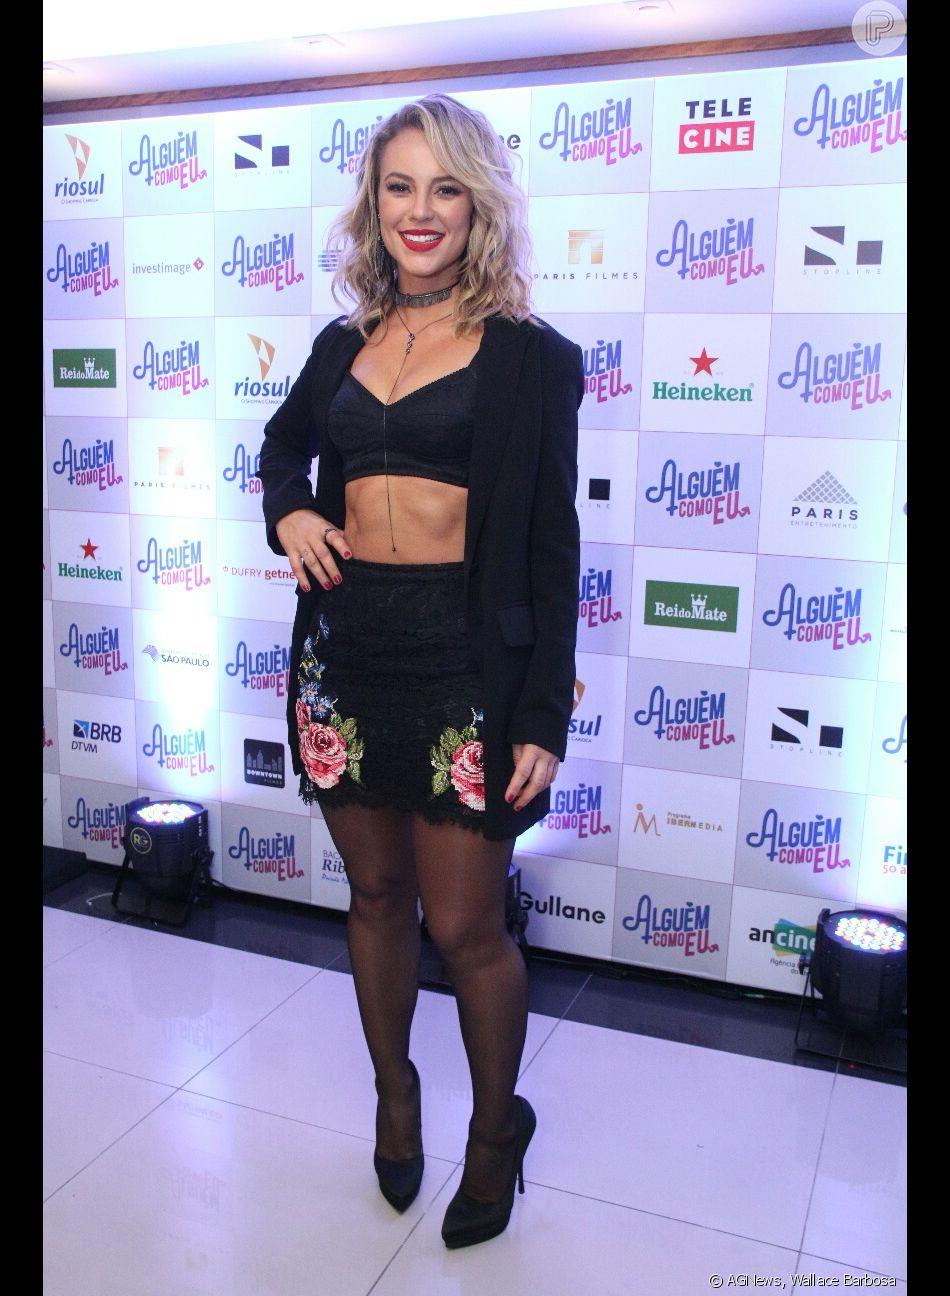 Paolla Oliveira combinou messy hair e look Gucci para o lançamento do filme  'Alguém Como Eu', no shopping Rio Sul, no Rio, nesta segunda-feira, 14 de maio de 2018